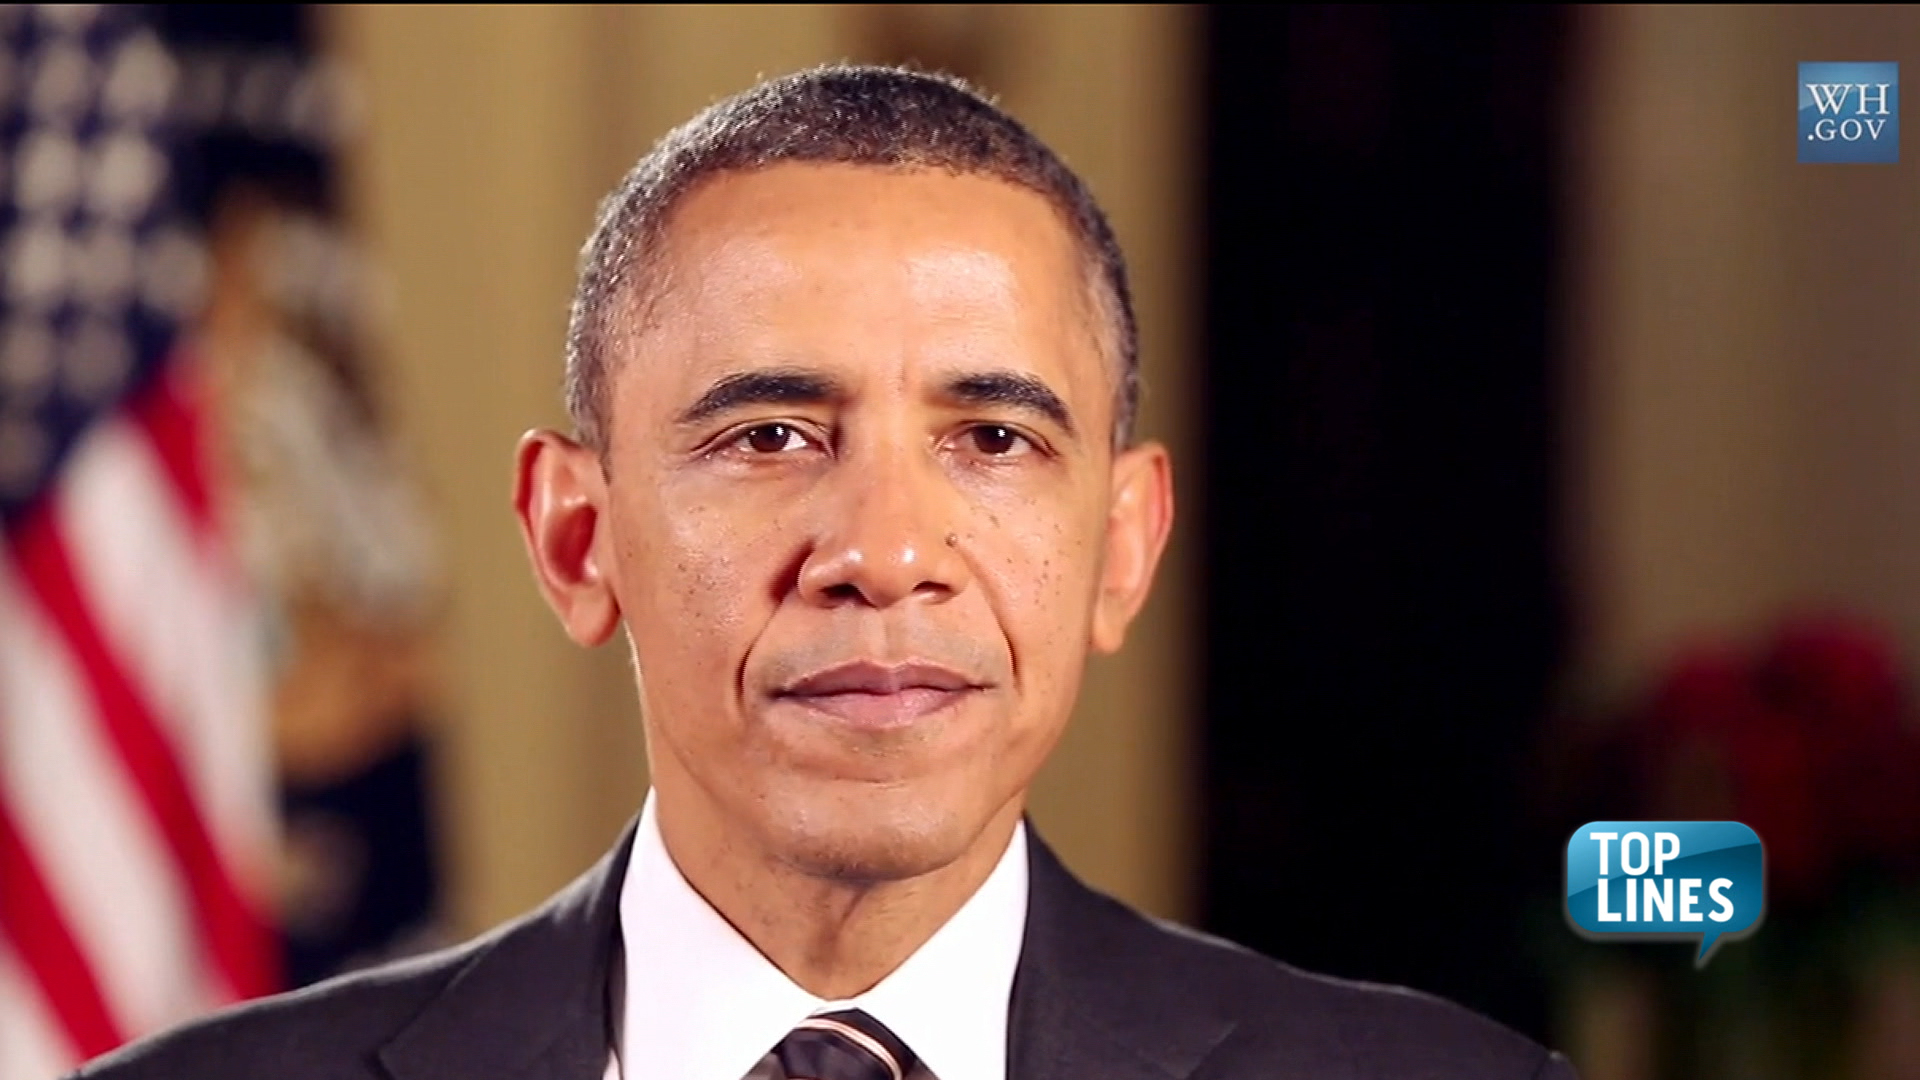 Top Lines: Obama talks gun control